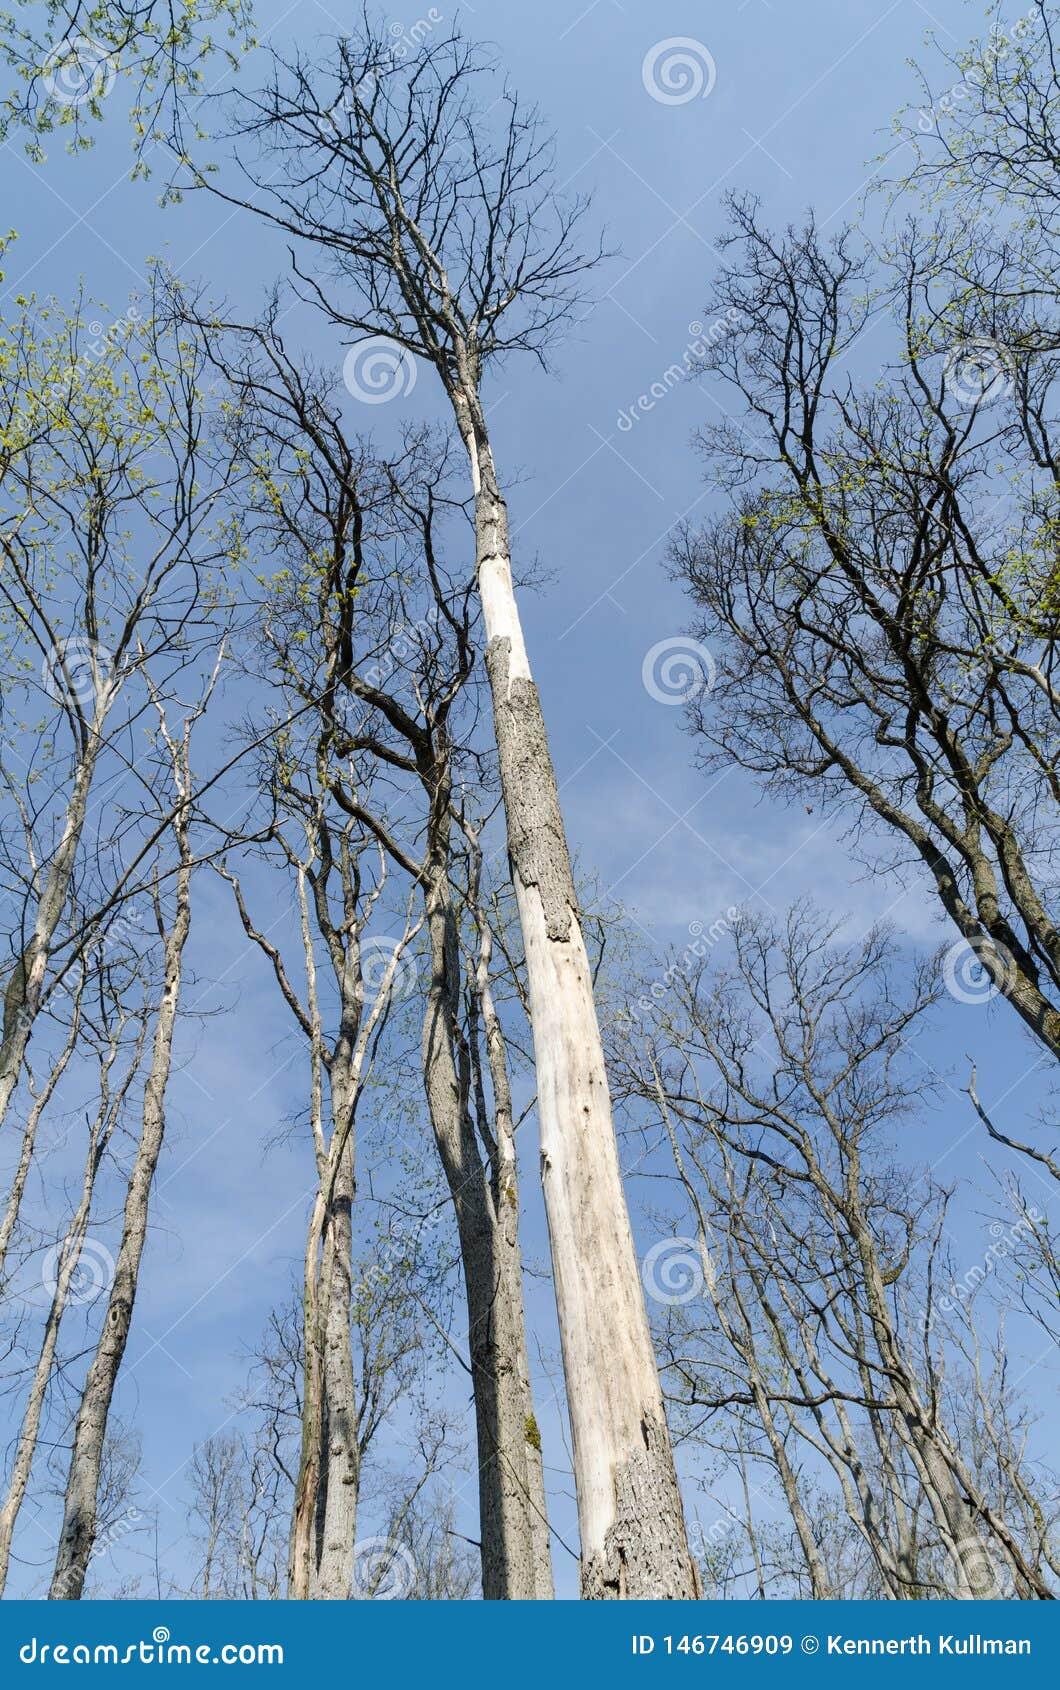 Damaged elm trees by dutch elm disease